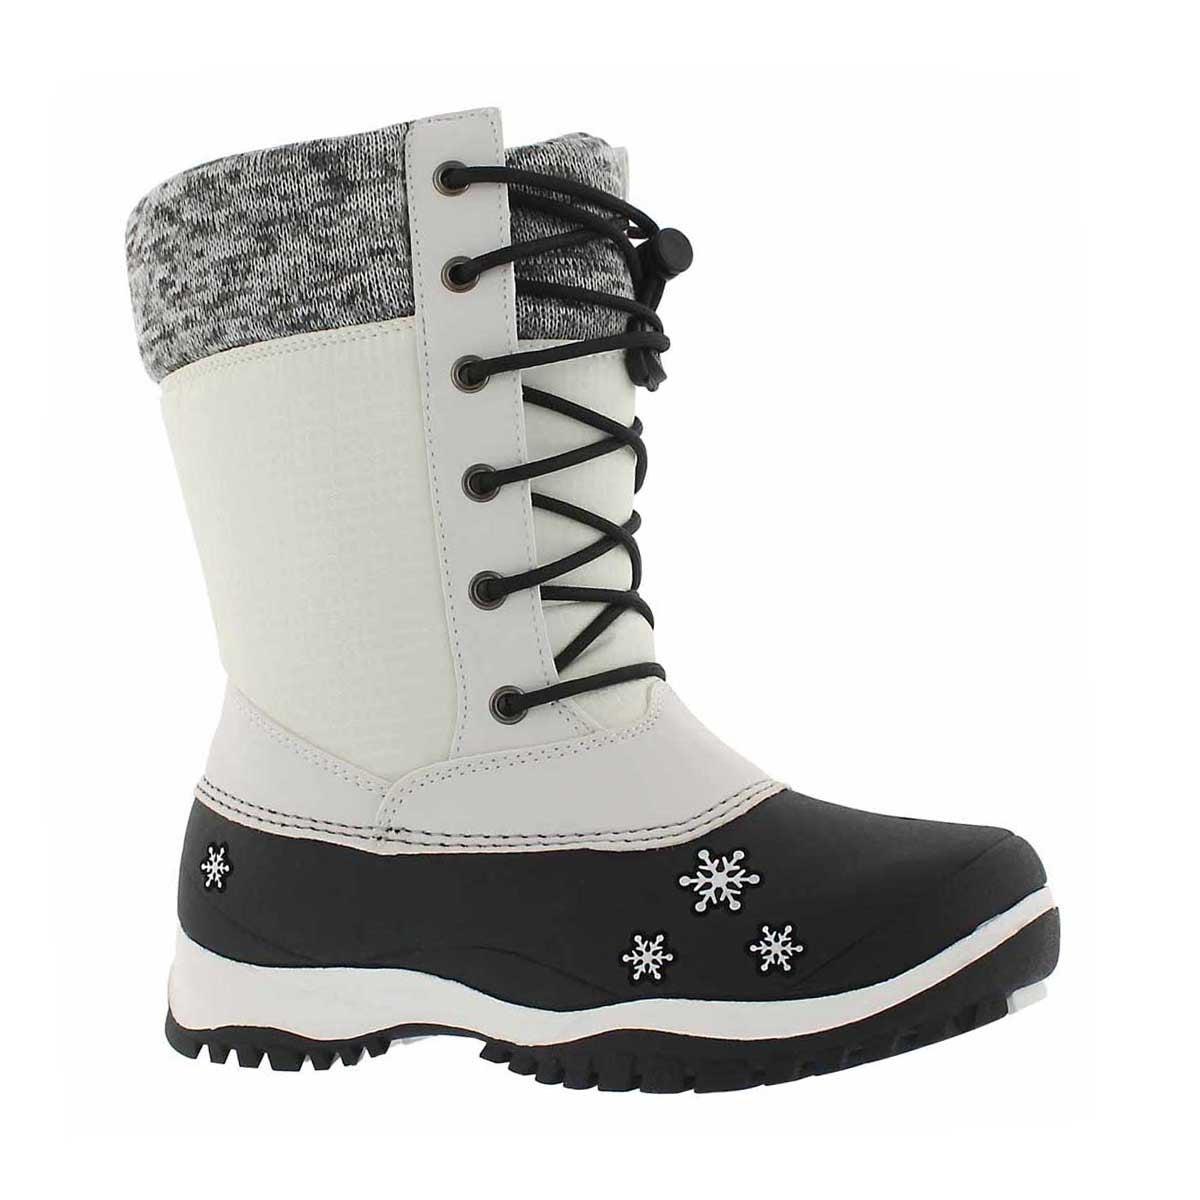 Grls Avery white wtpf winter boot